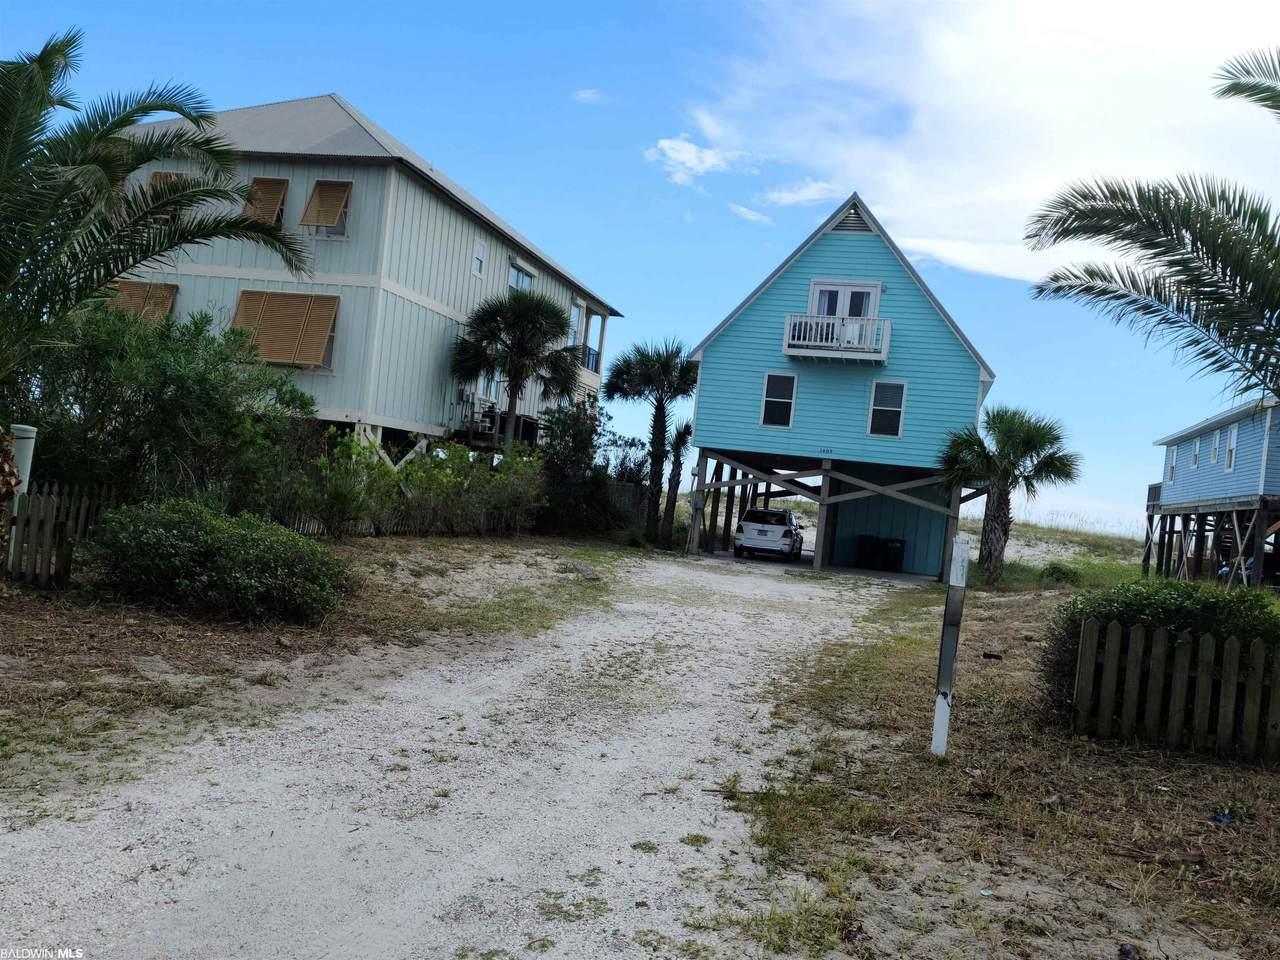 1489 Beach Blvd - Photo 1